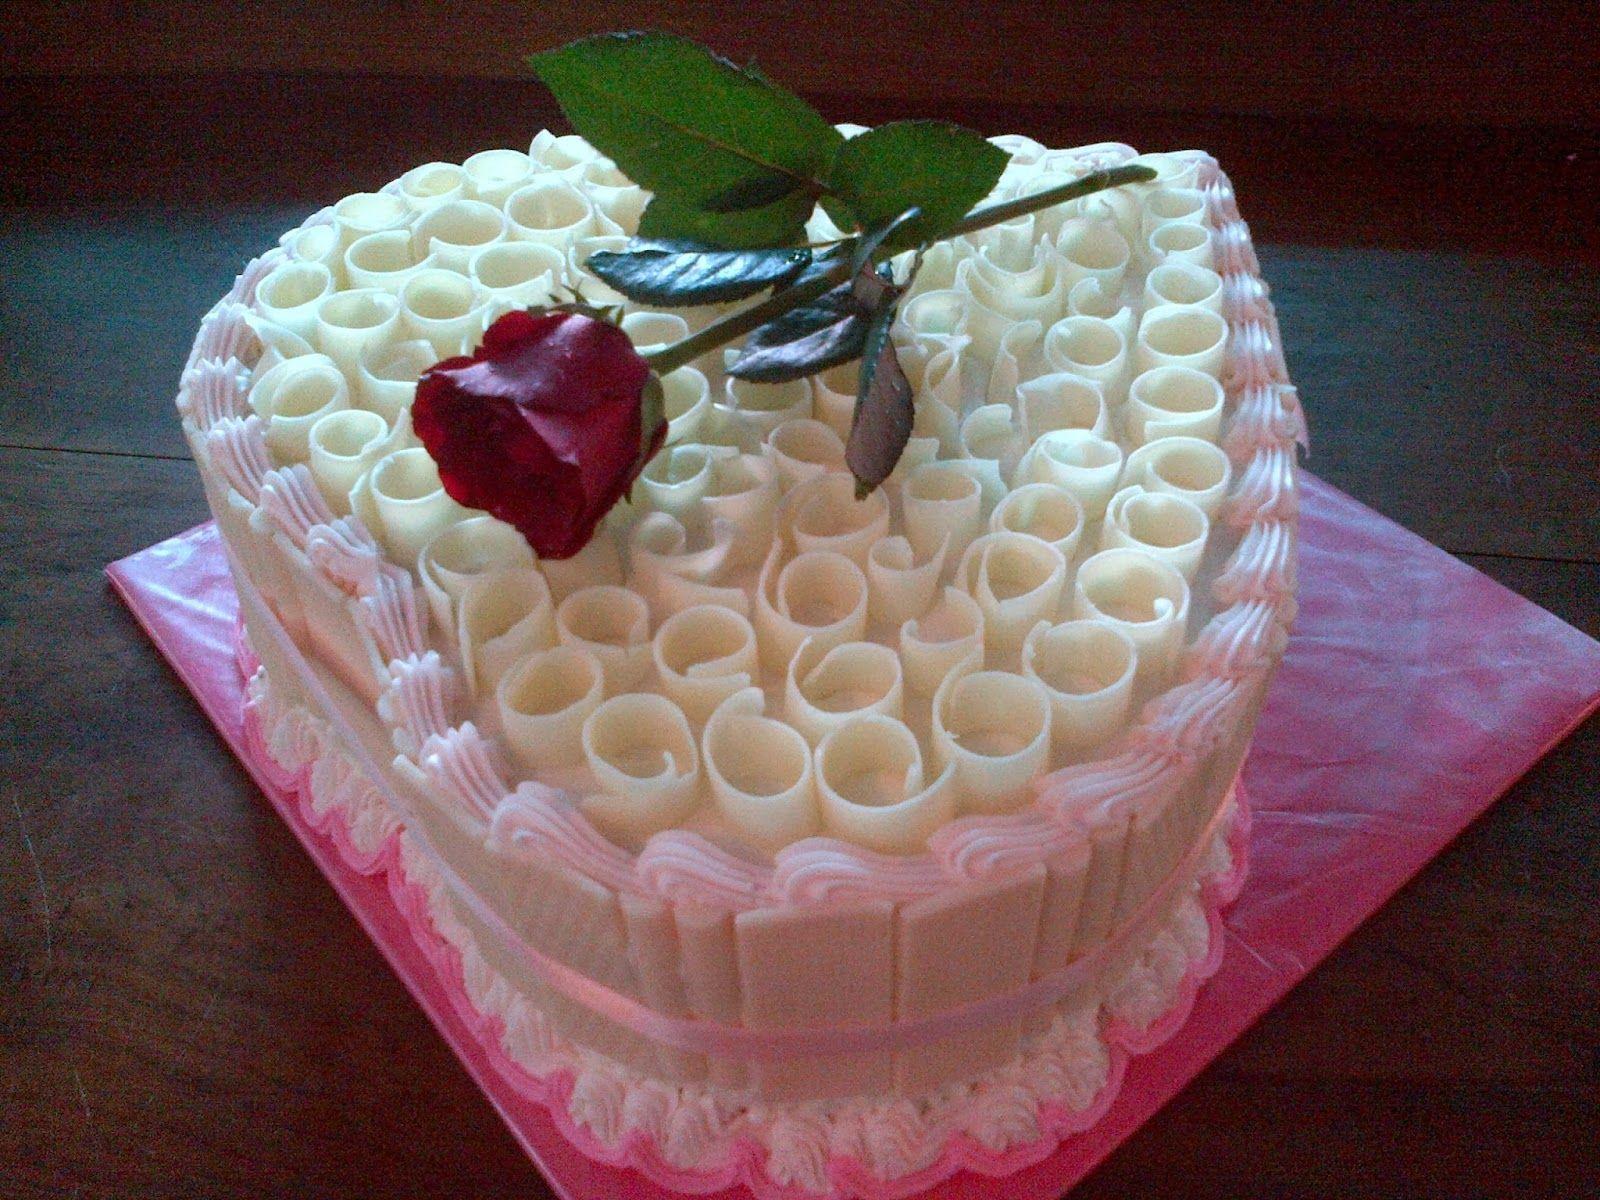 Gambar Kue Ulang Tahun Bunga Mawar Maraknya Kemajuan Zaman Yang Lebih Maju Dan Canggih Aplikasi Bbm Merupakan Merupakan Aplikasi Chatting Desserts Cake Food